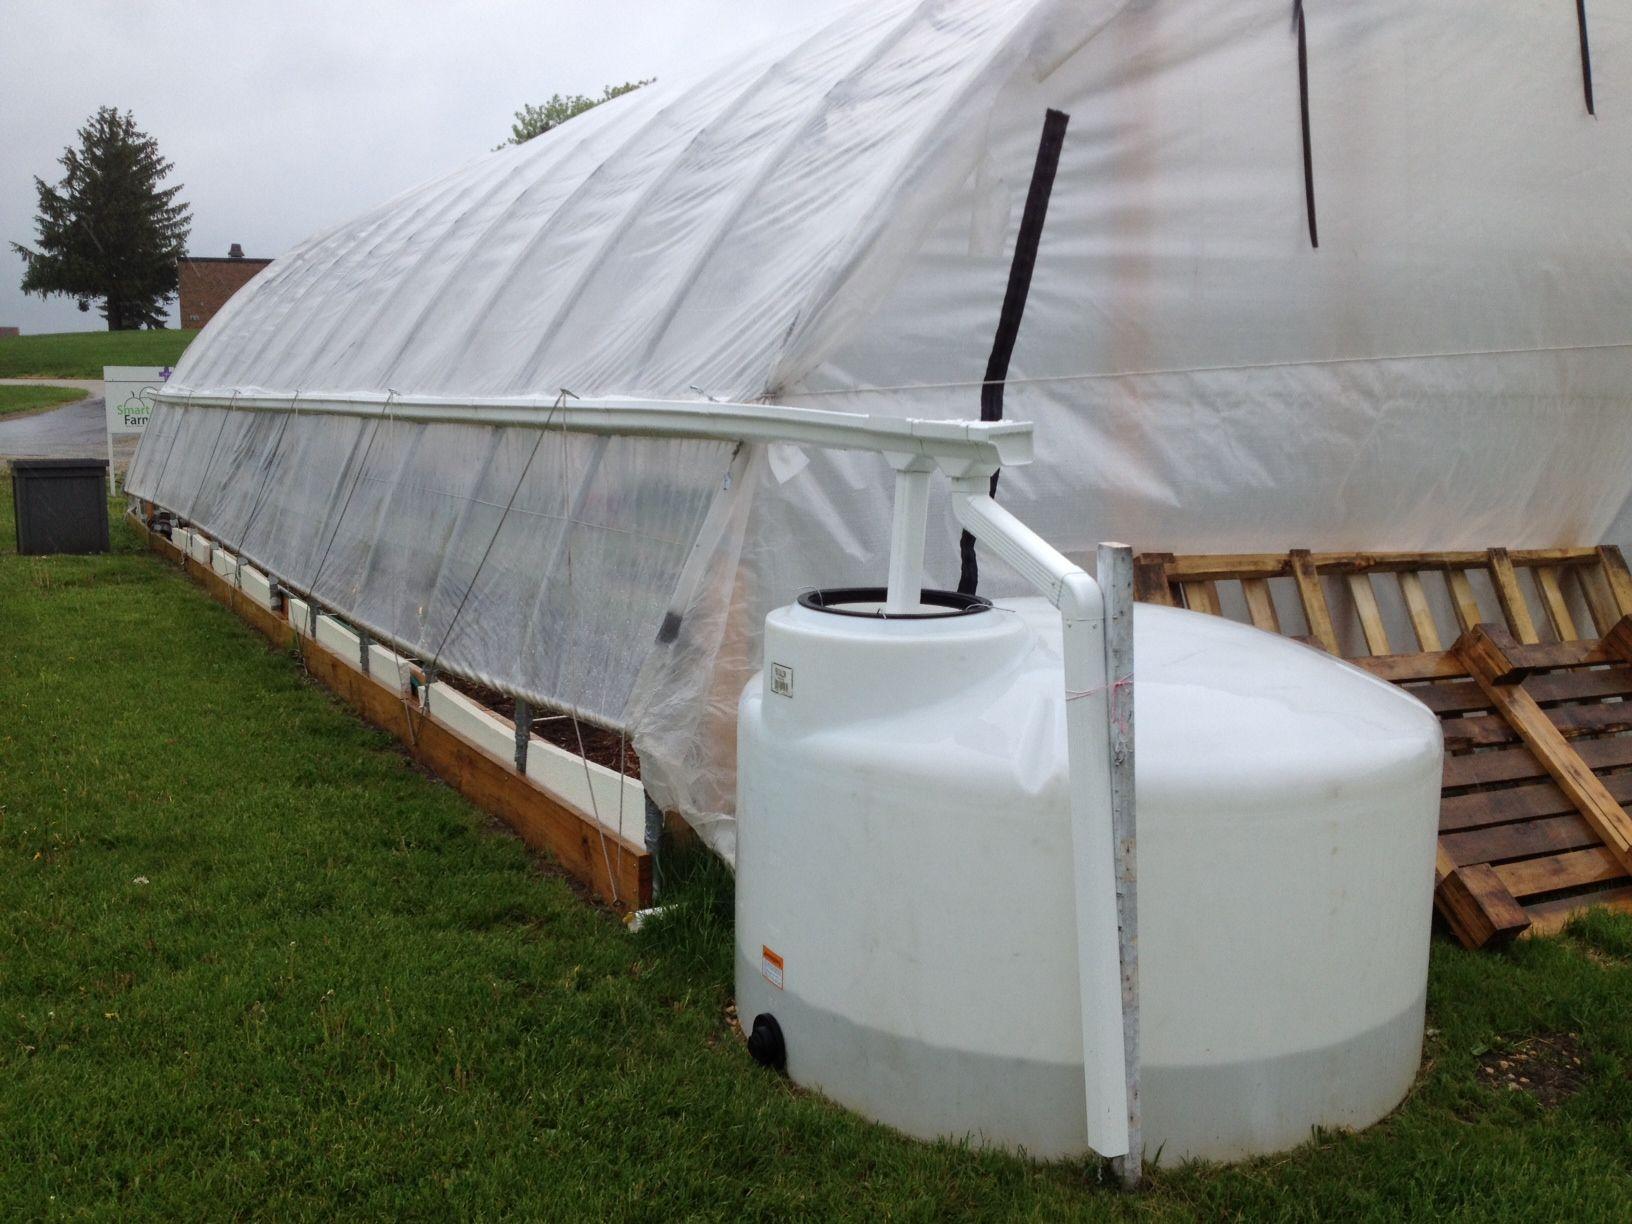 hoophouse rainwater catchment - 8x10 Hoop House Plans